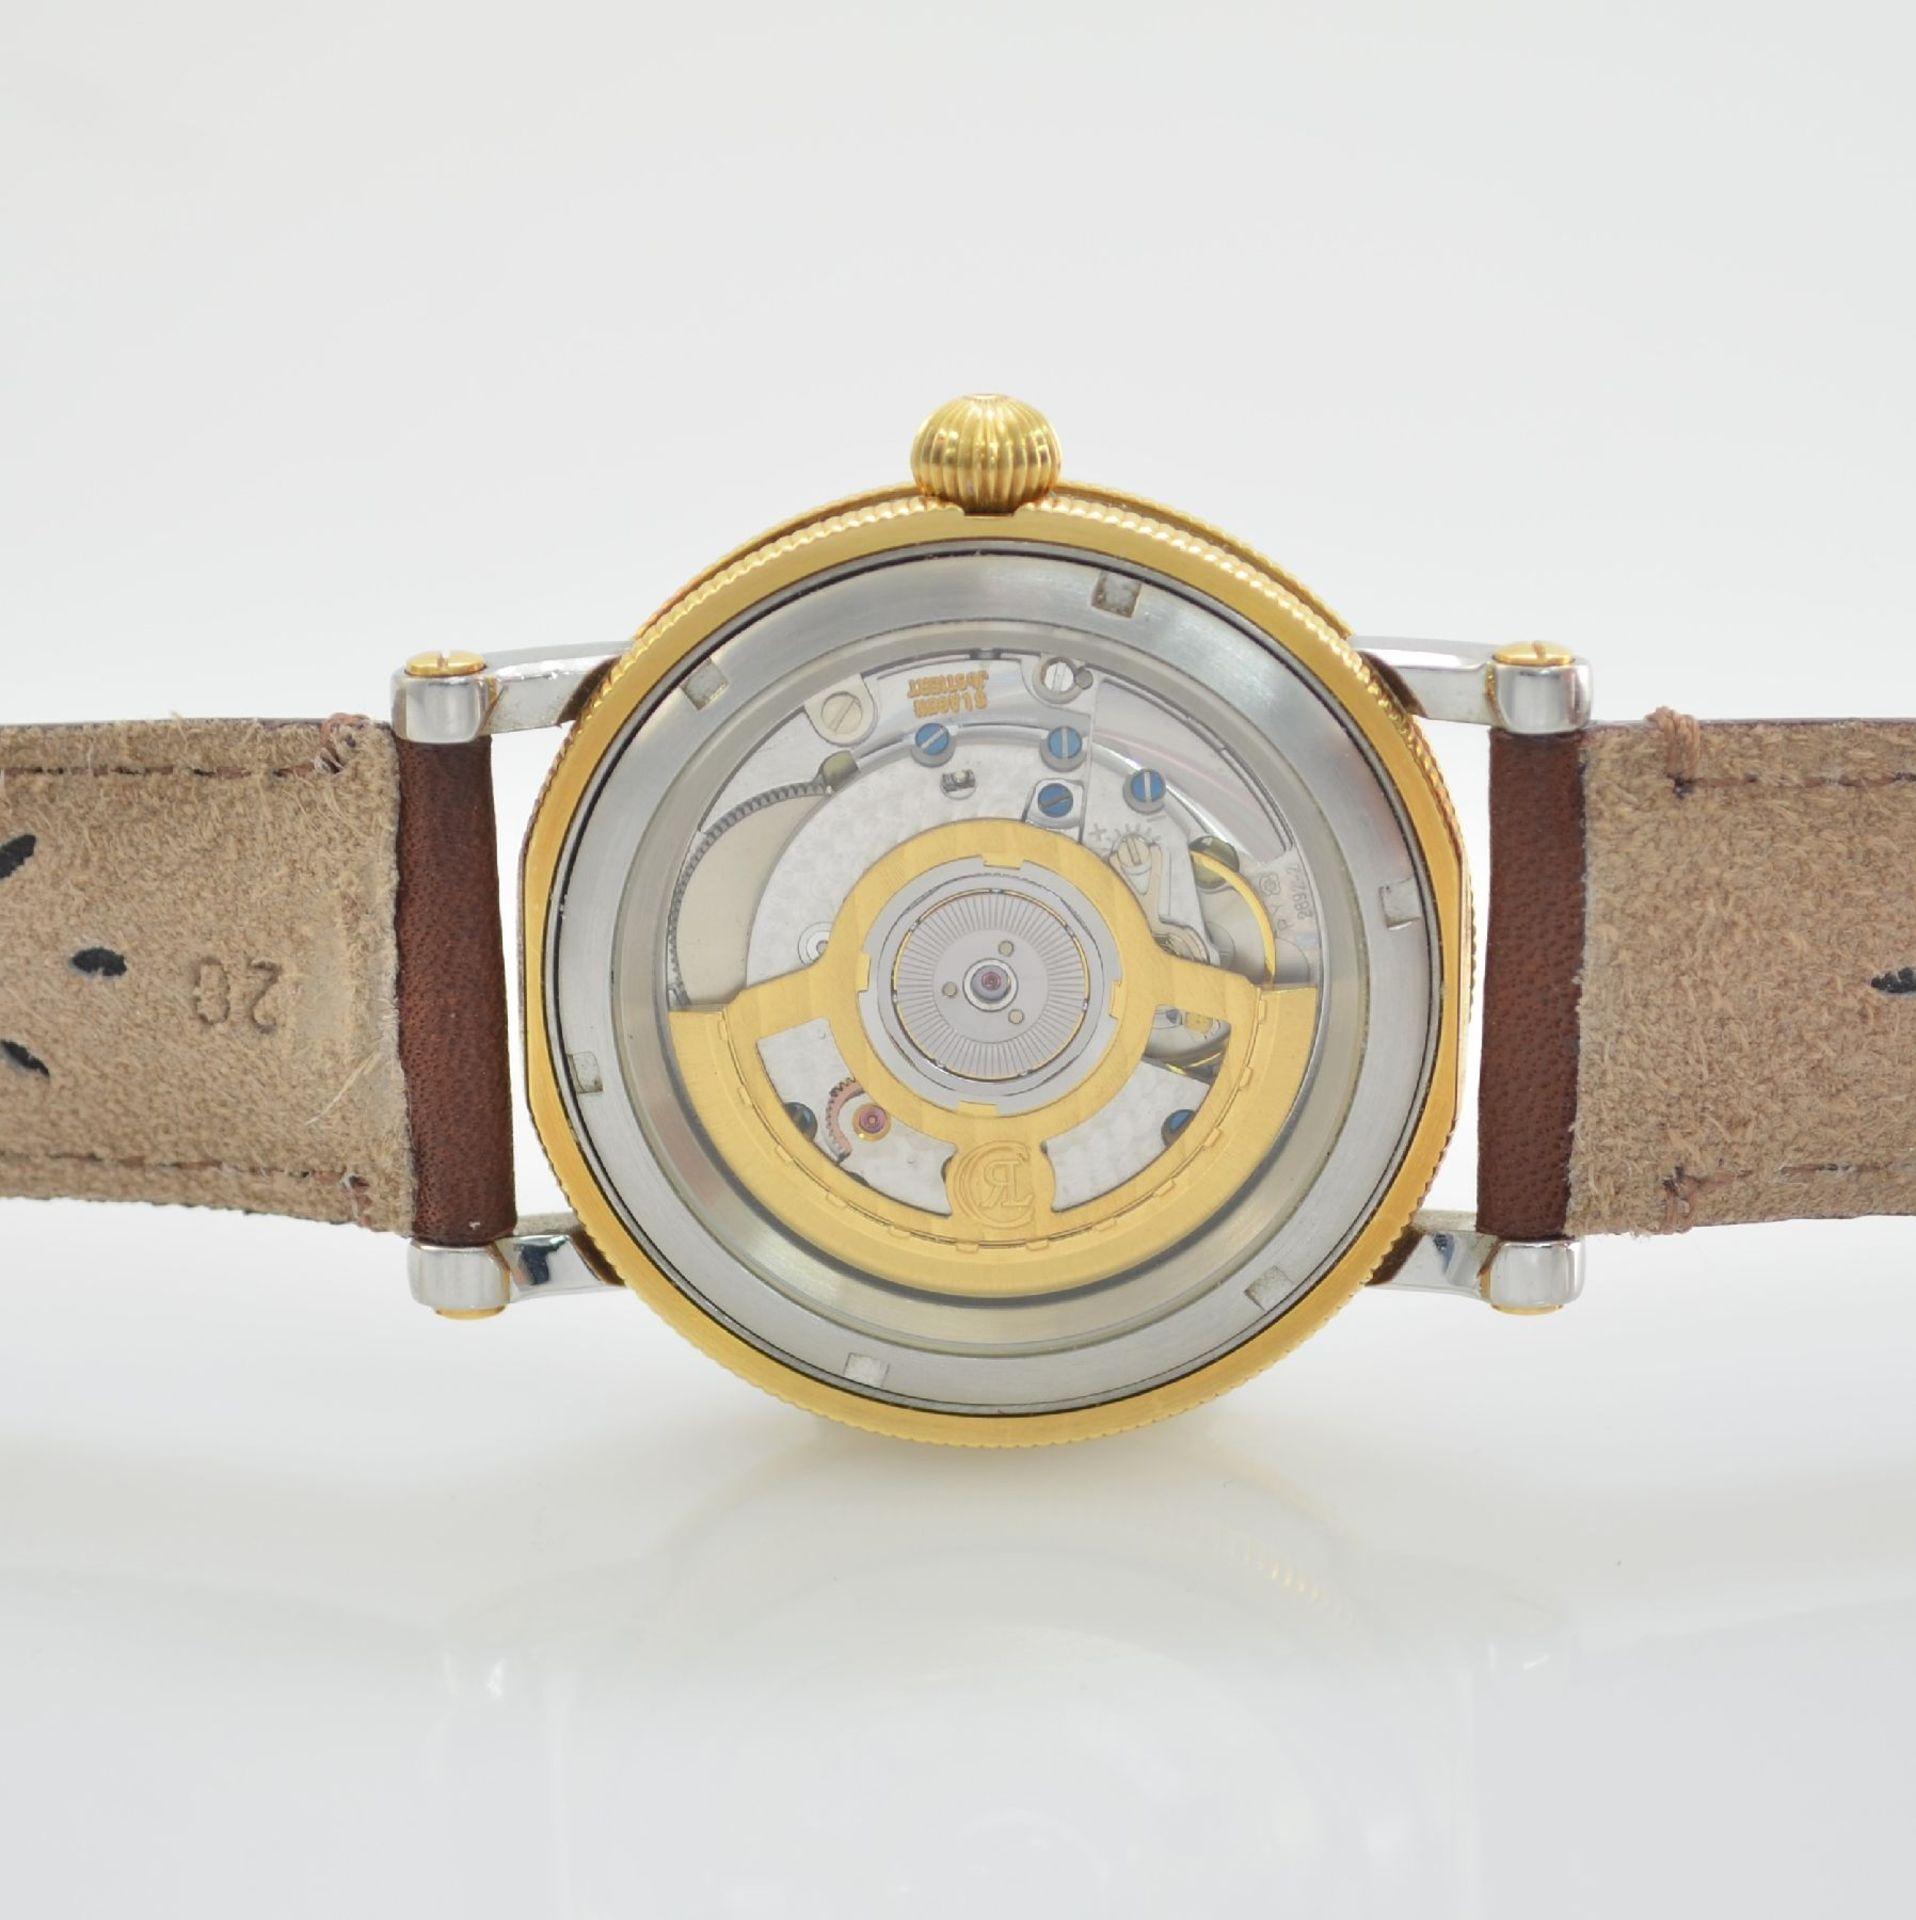 CHRONOSWISS Chronometer Herrenarmbanduhr, Automatik, Ref. CH 2822, Edelstahl/Gold kombiniert inkl. - Bild 6 aus 7